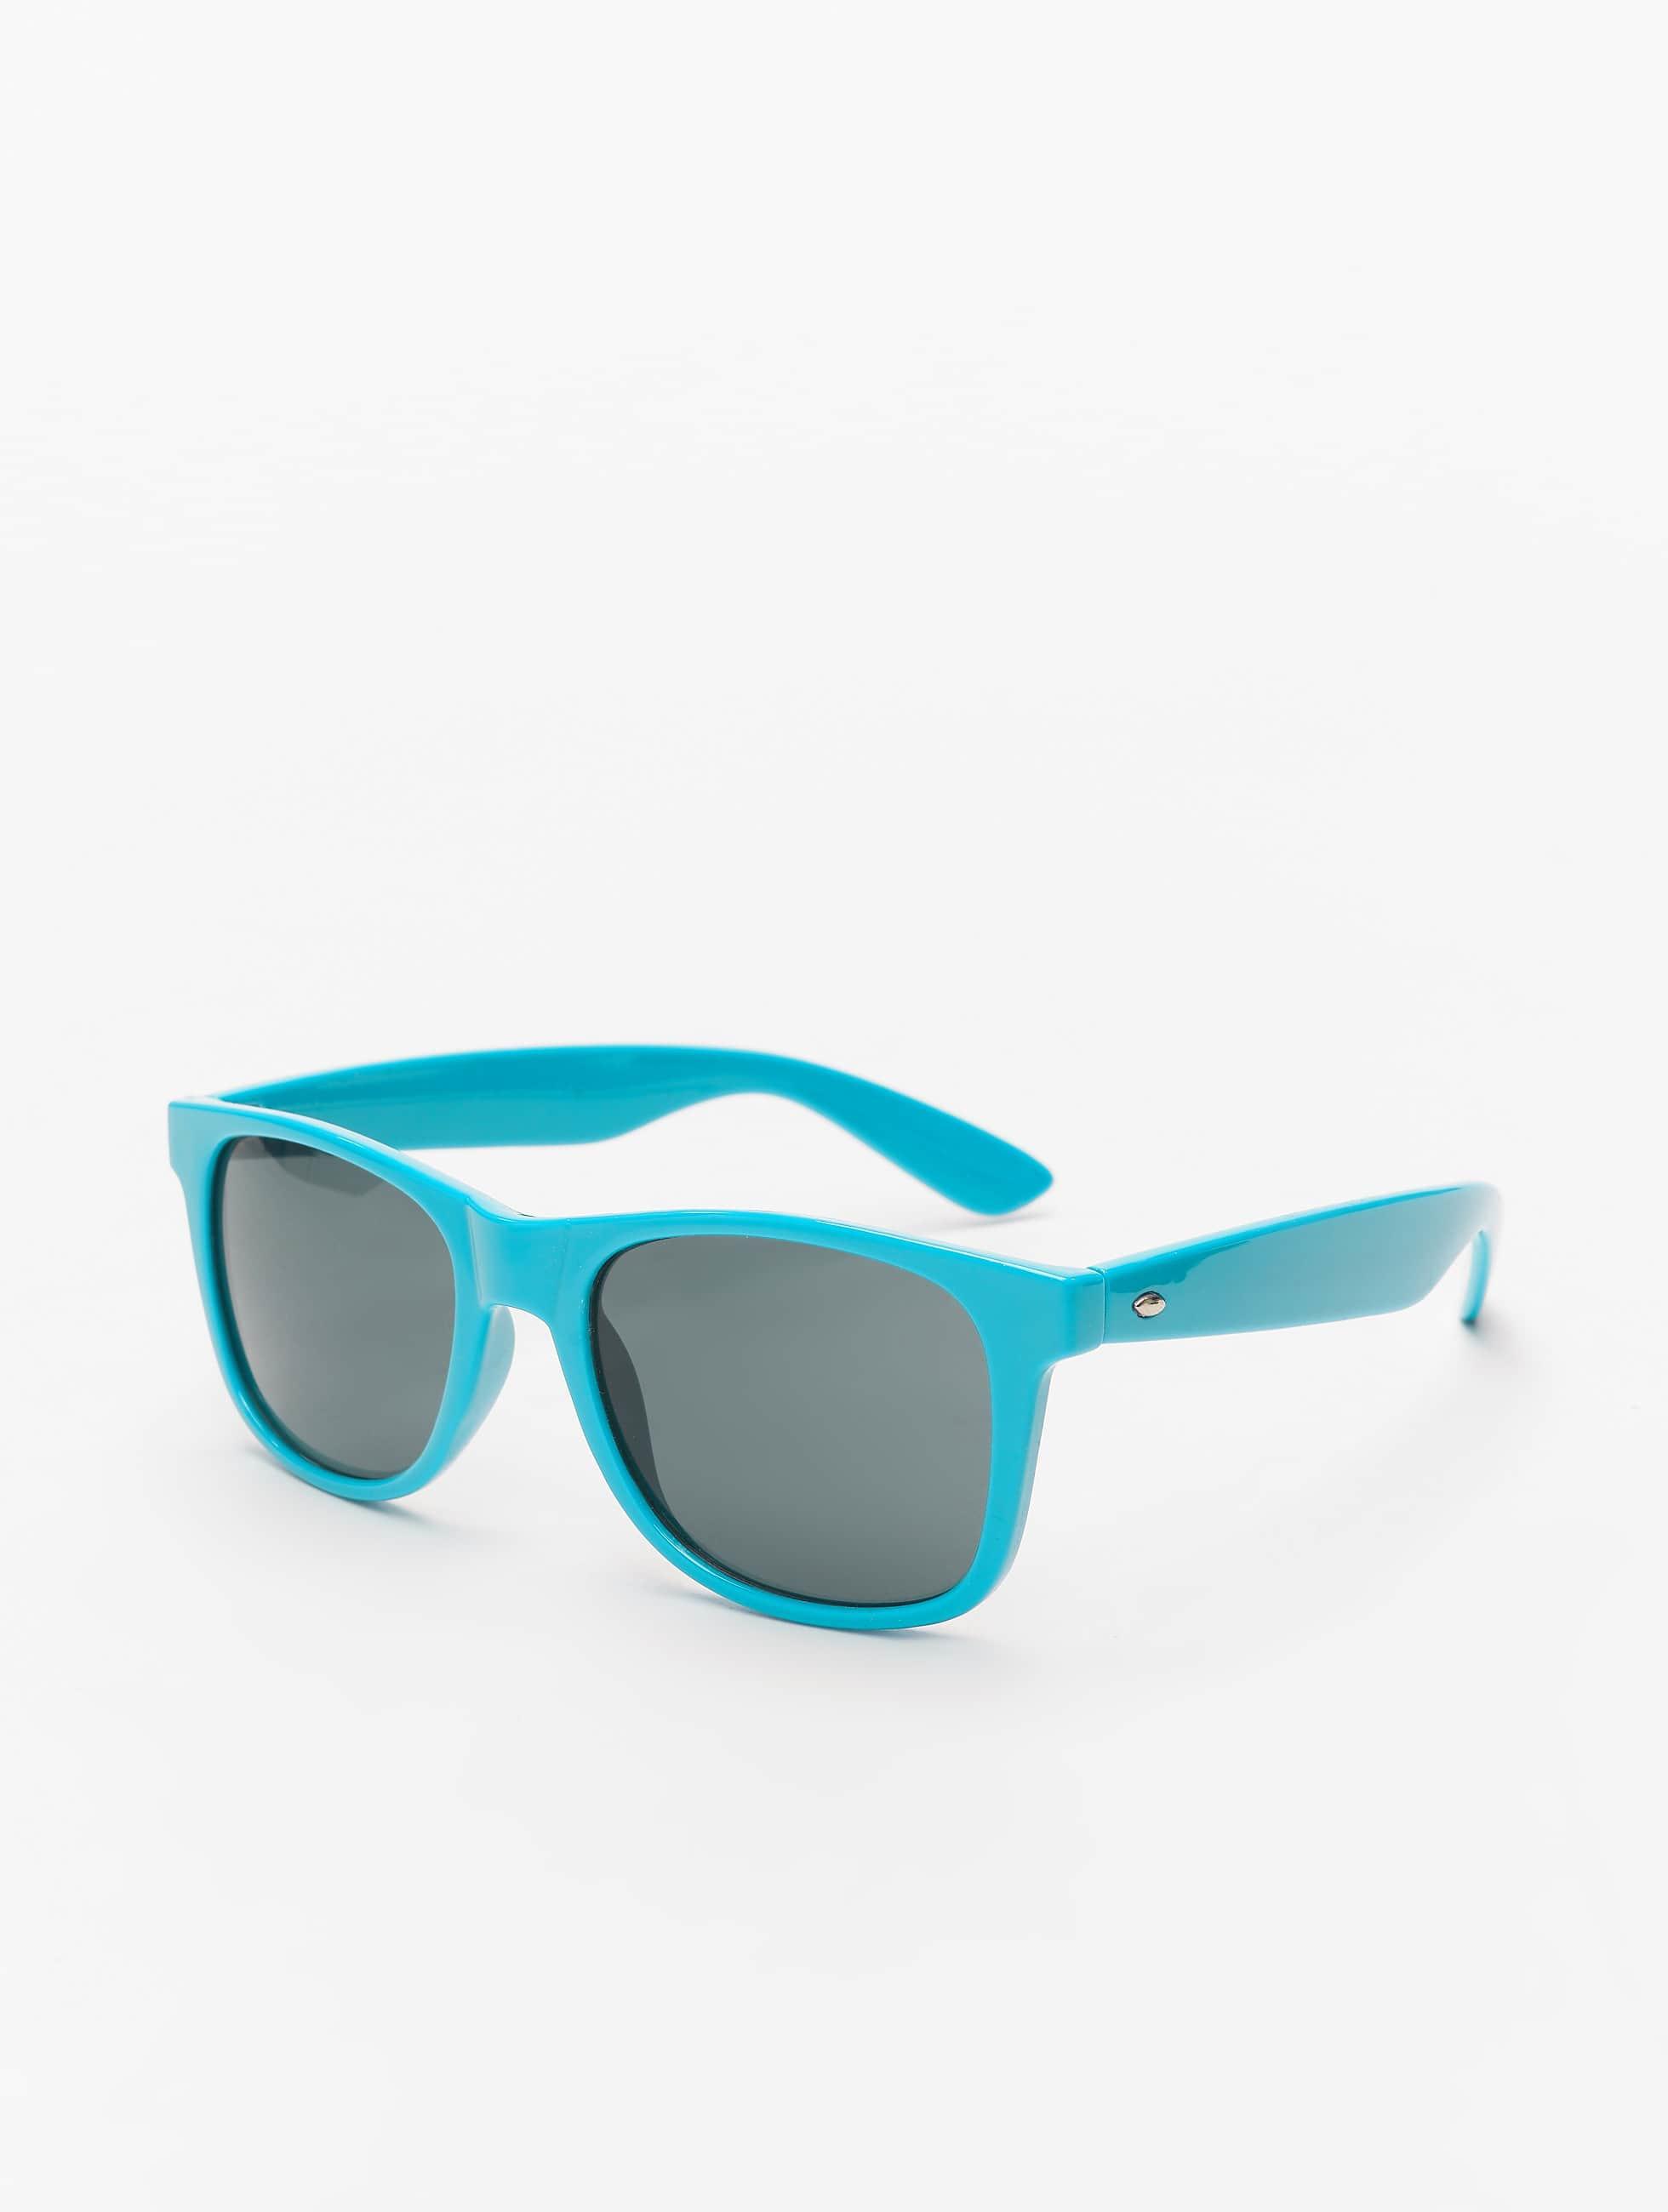 MSTRDS Männer,Frauen Sonnenbrille Groove Shades in türkis